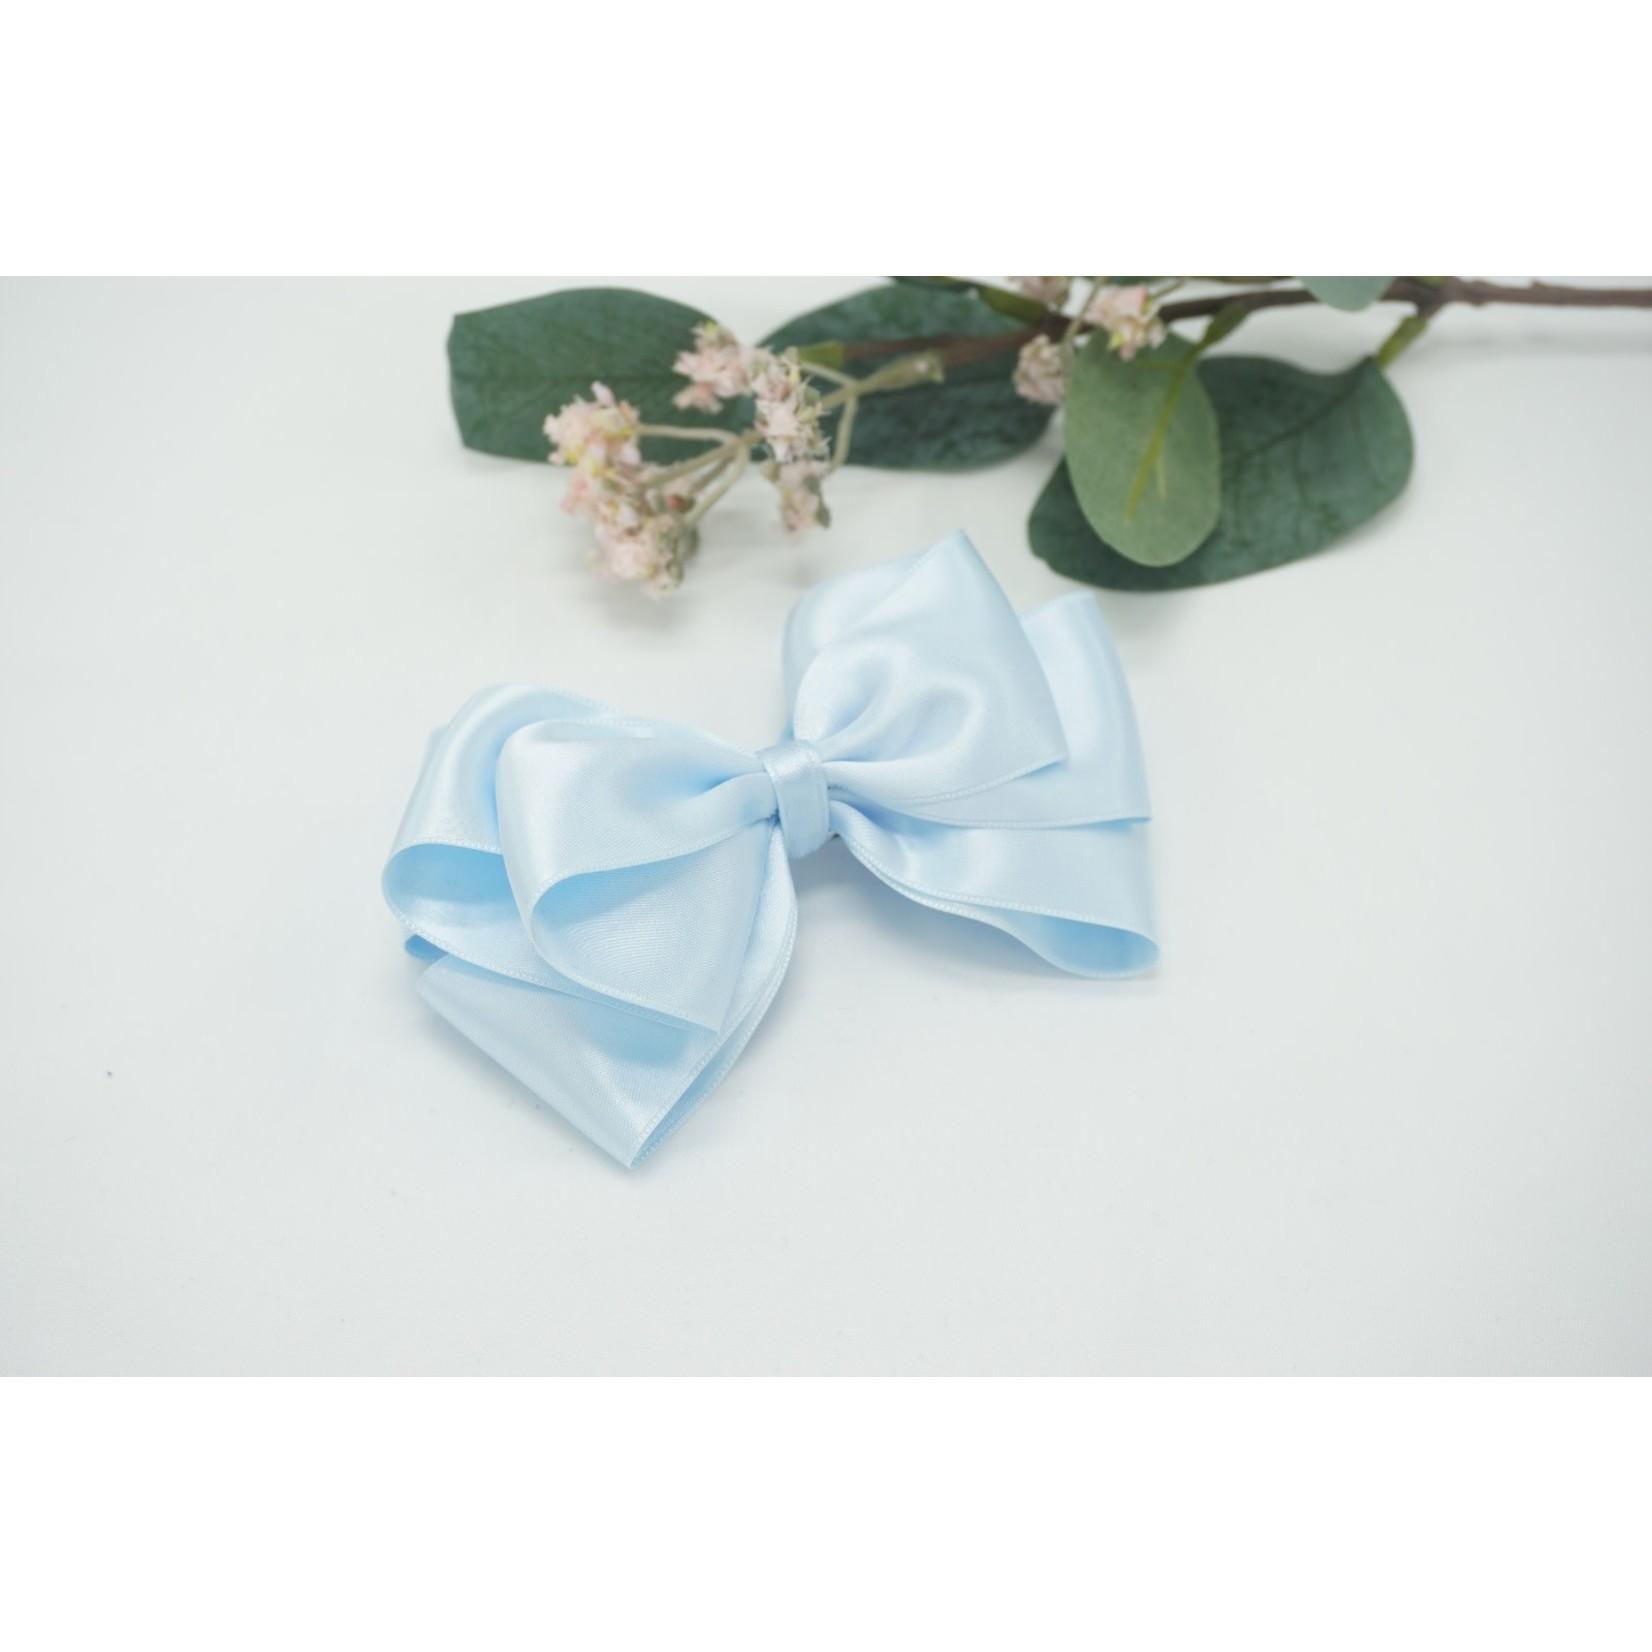 Petite Zara Butterfly Bow - Light Blue 12cm